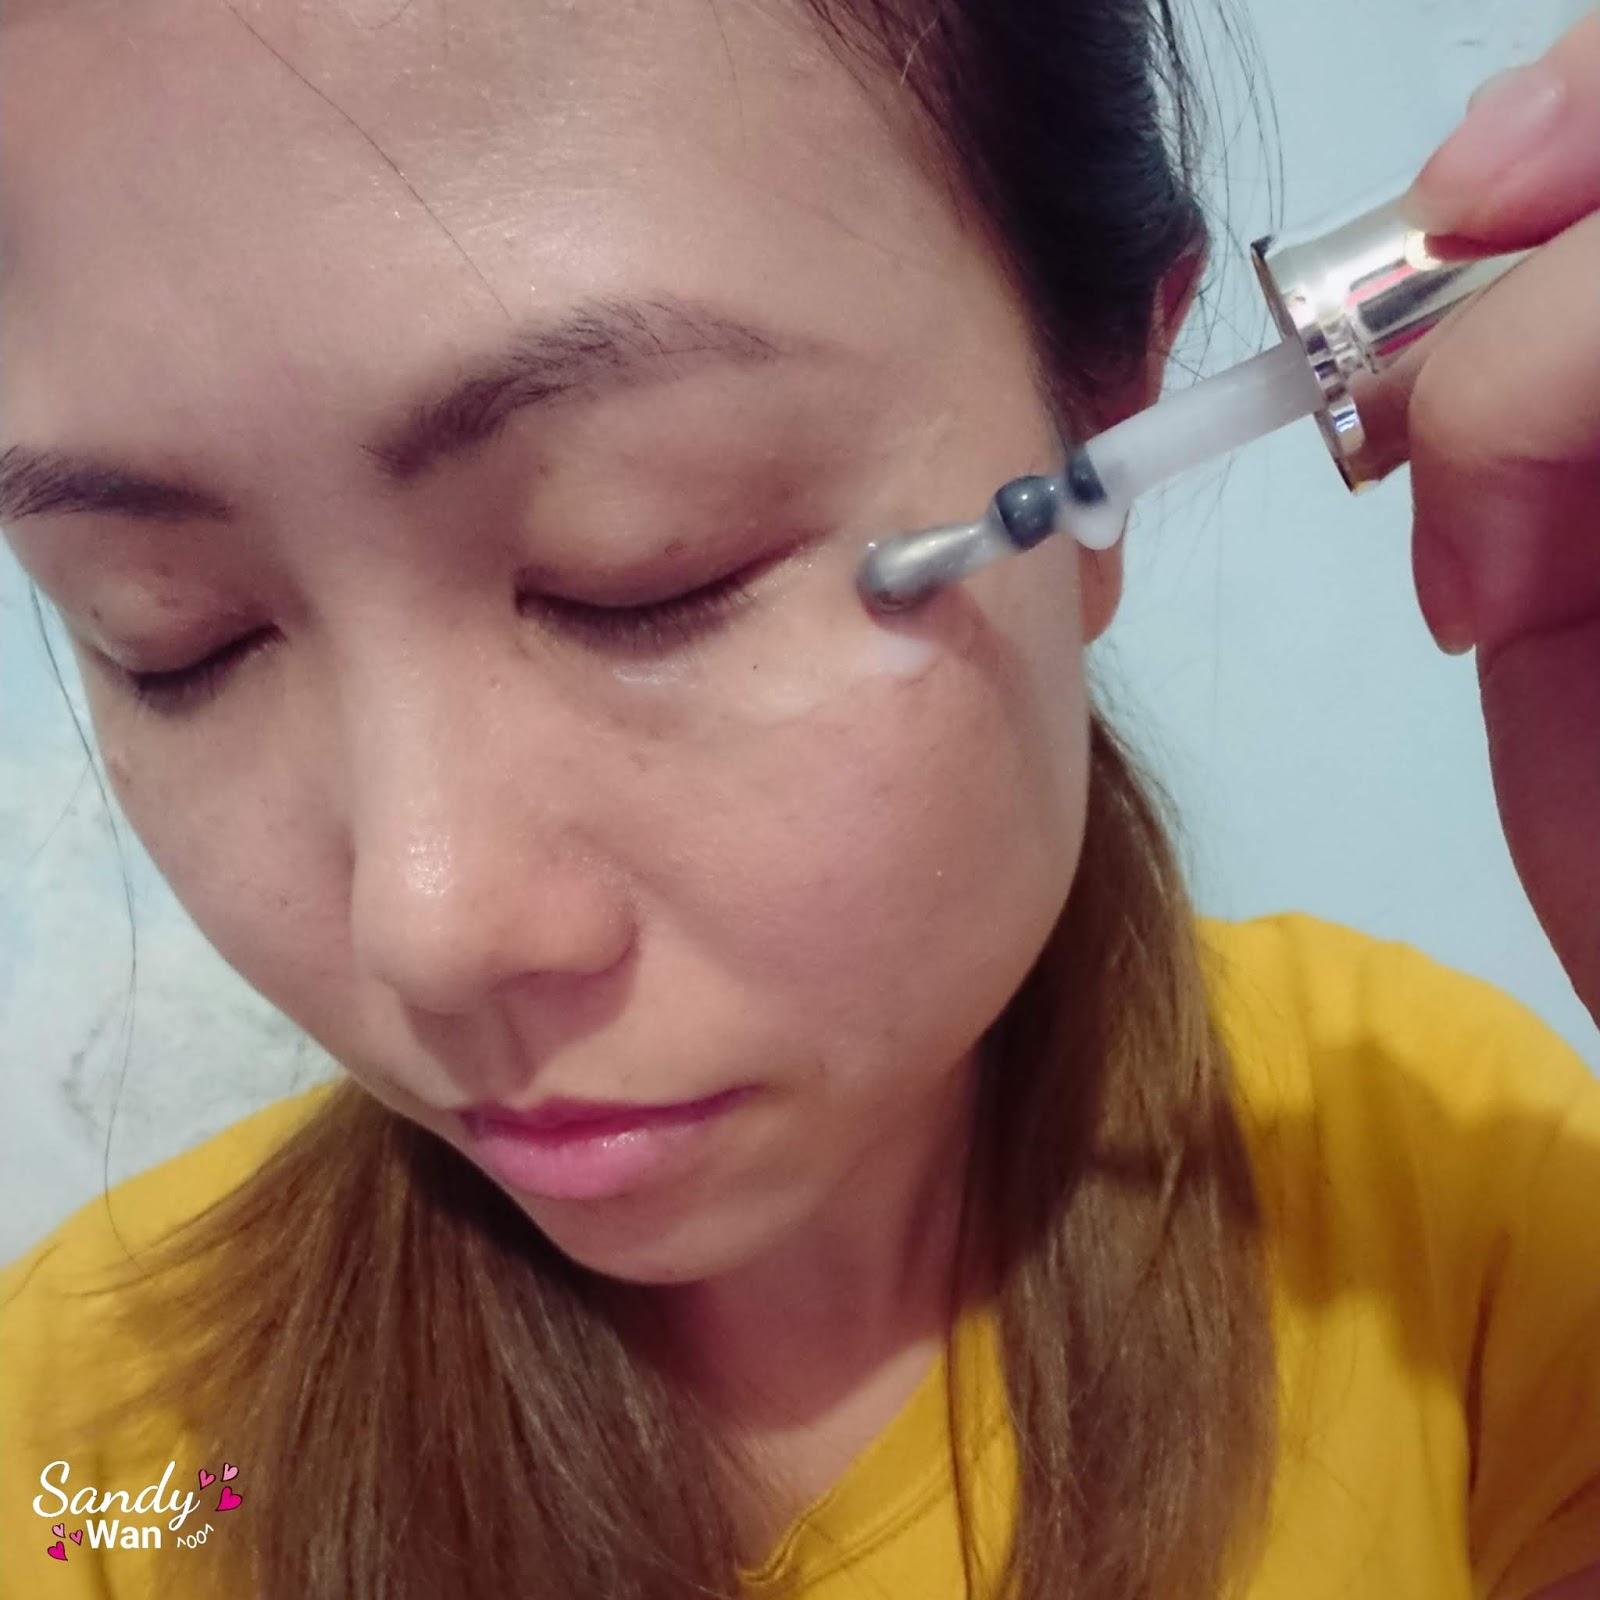 Beautylife HK - 對抗歲月痕跡,找回Bling Bling眼!【LANCOME Advanced